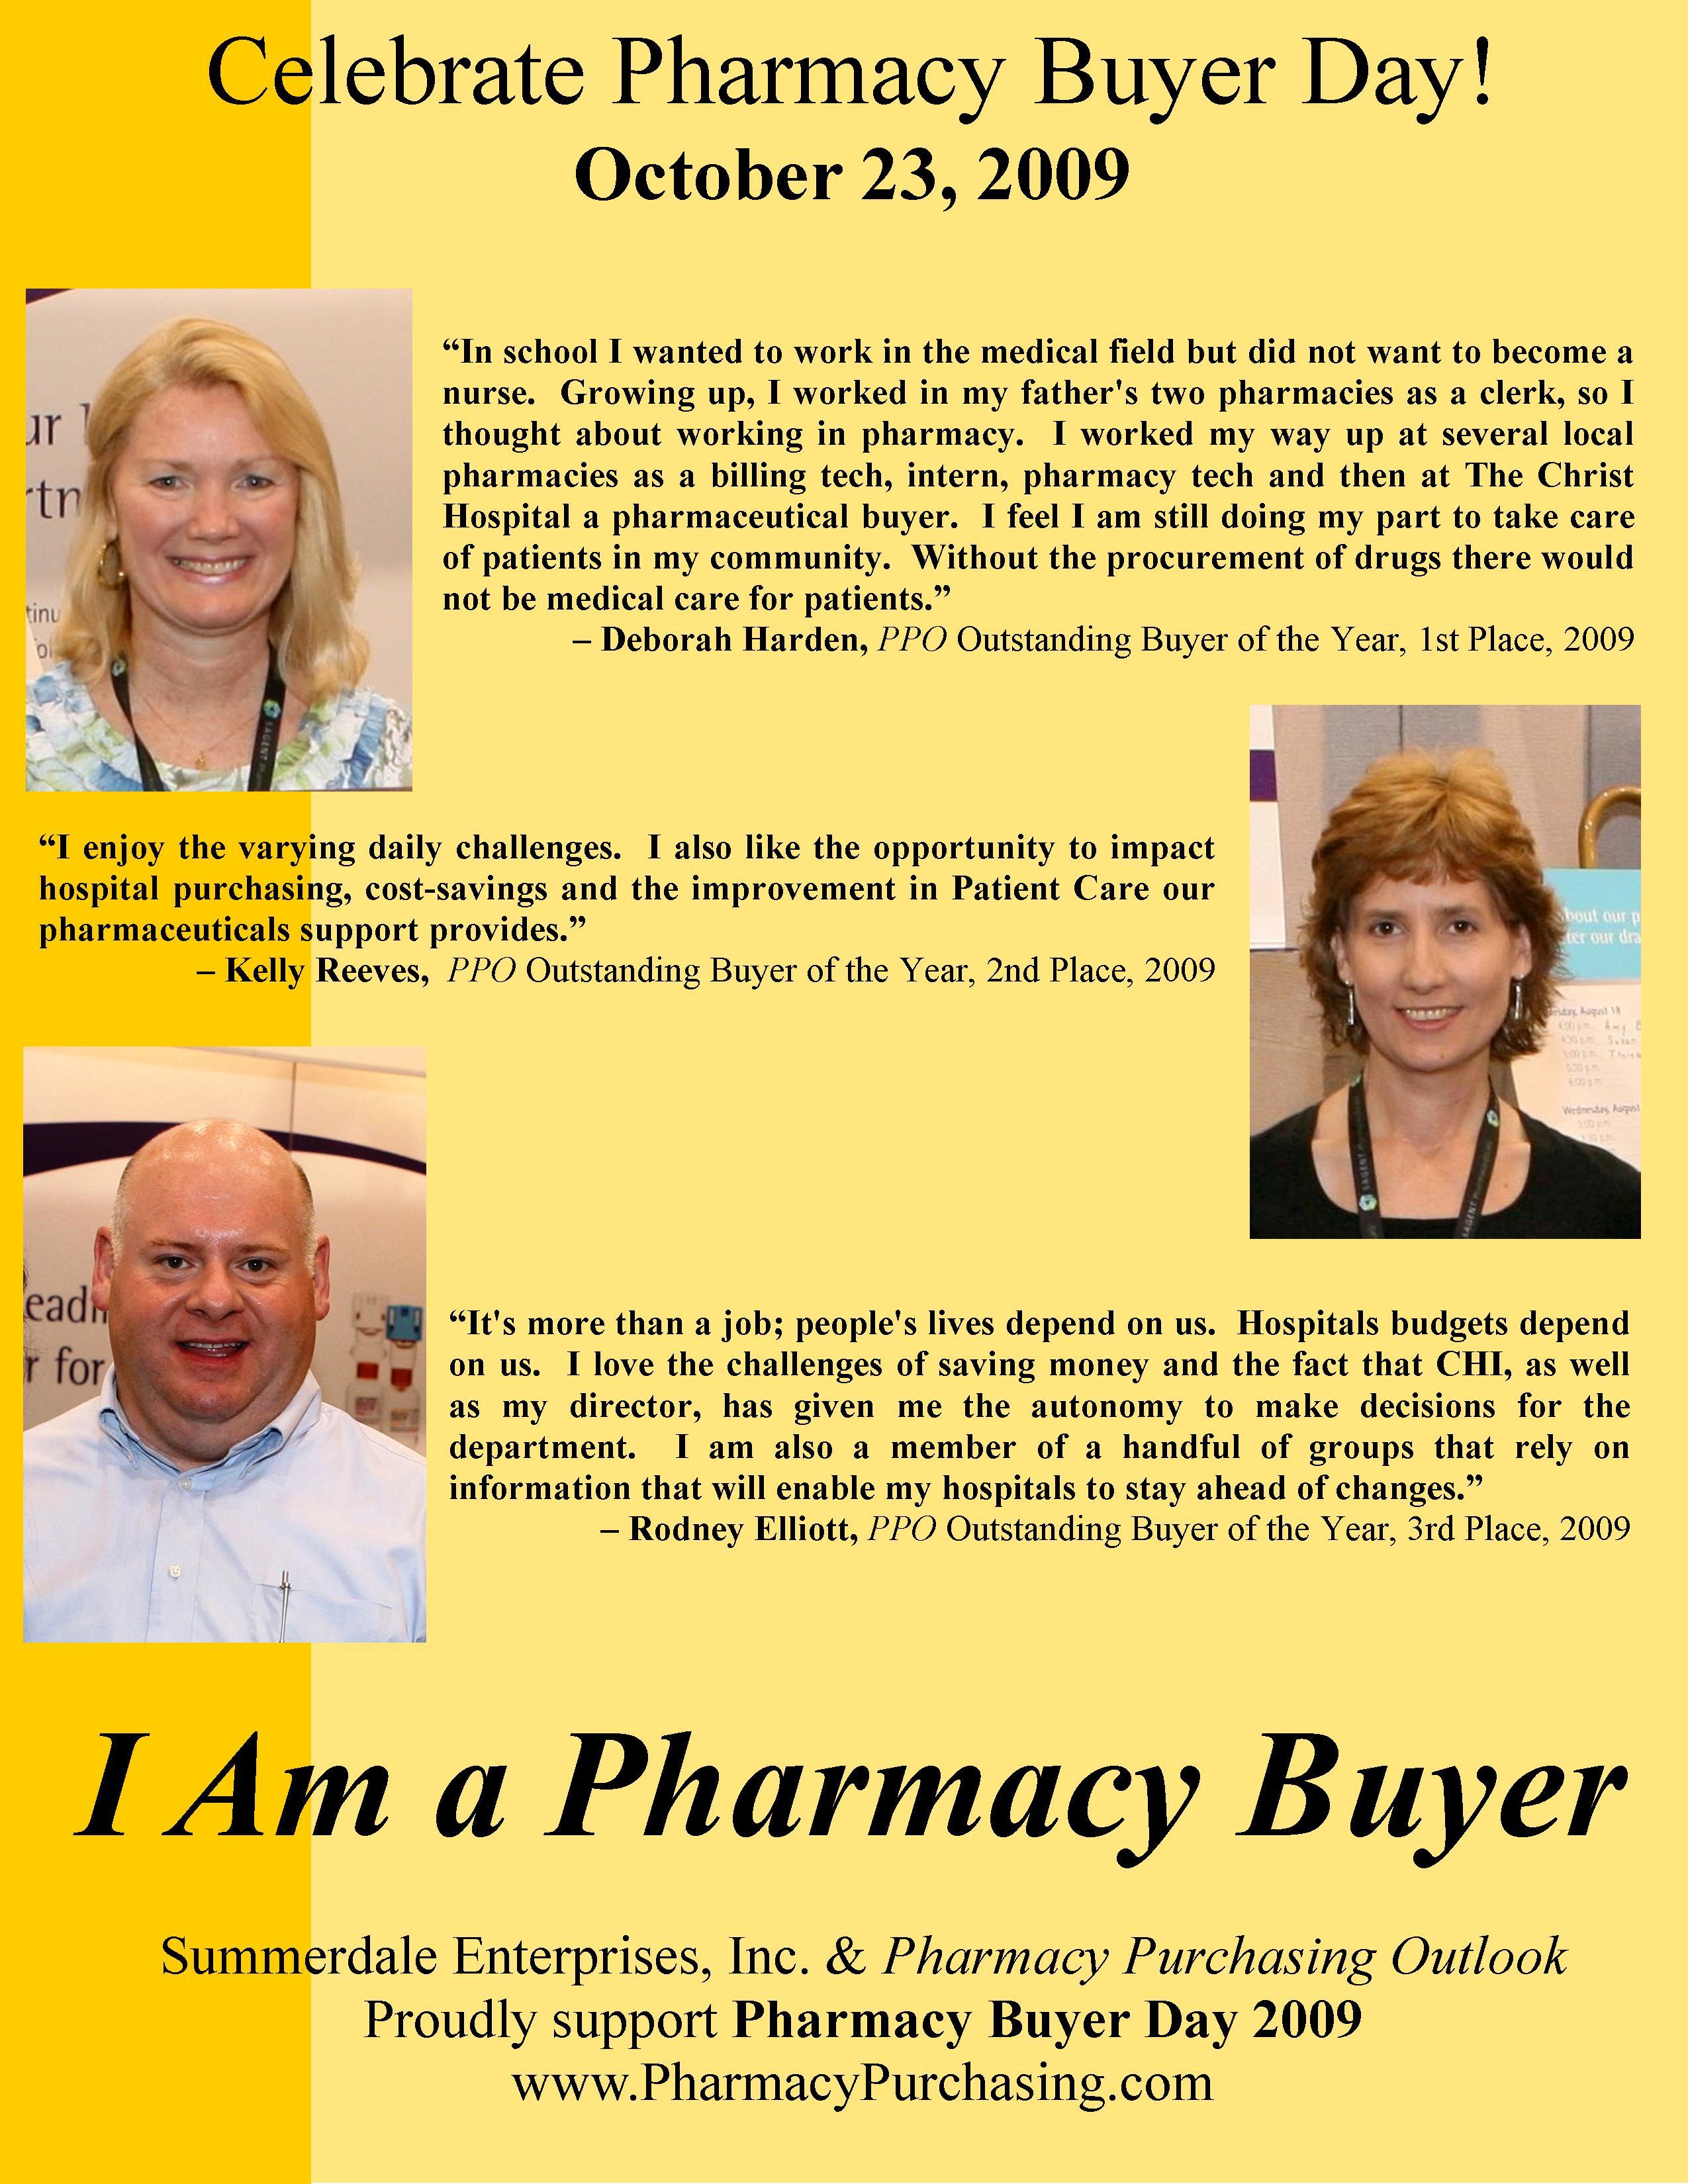 2009 Pharmacy Buyer Day Poster